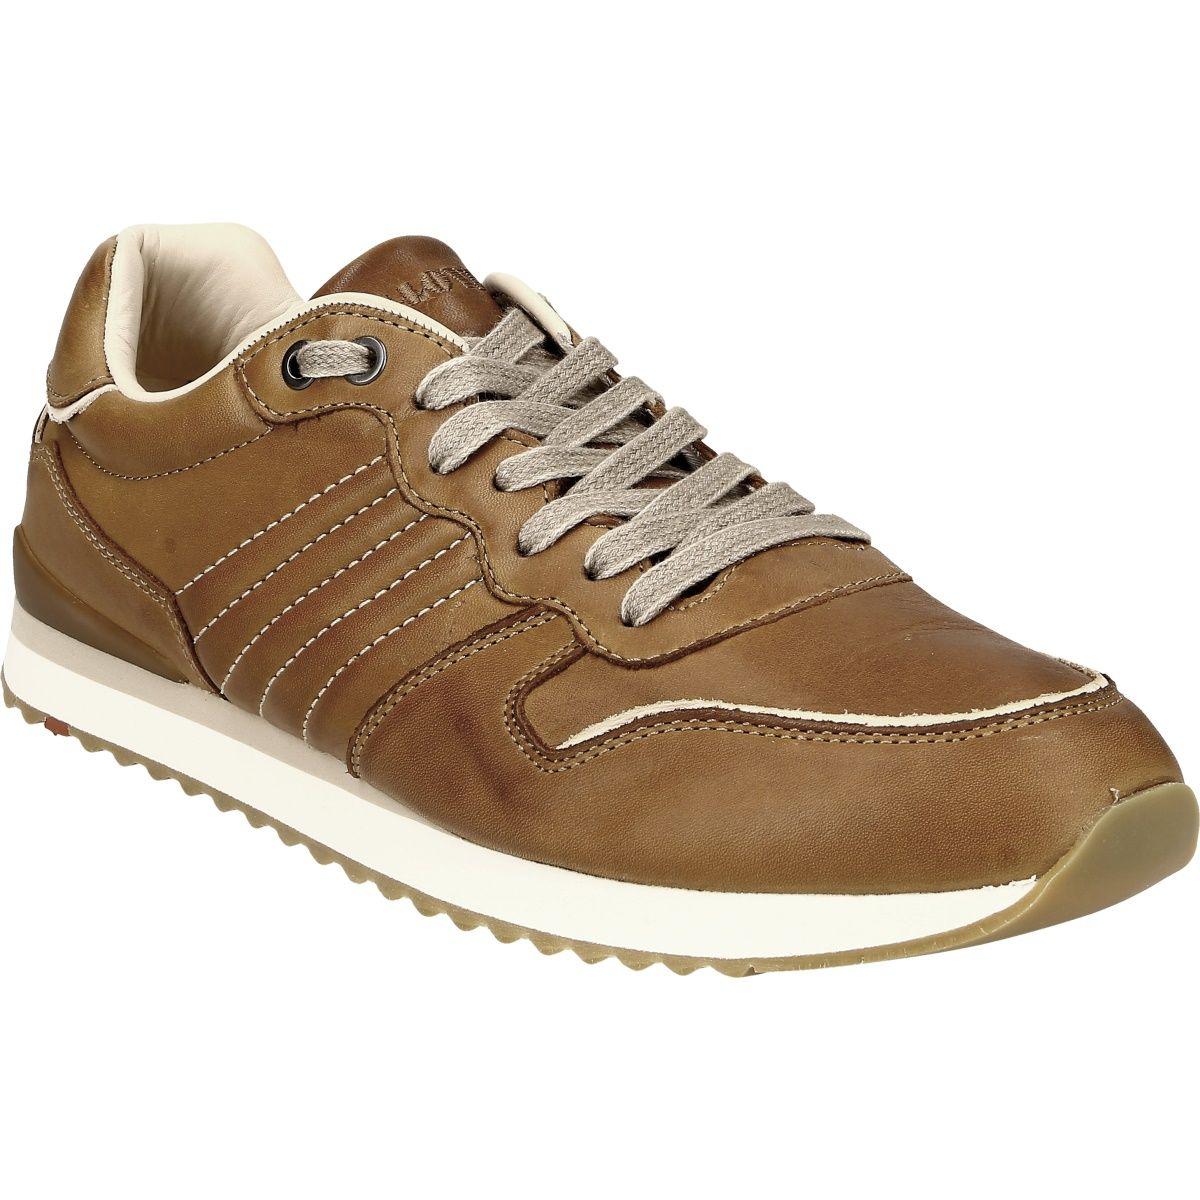 Lloyd 18 400 02 Edico Men S Shoes Lace Ups Buy Shoes At